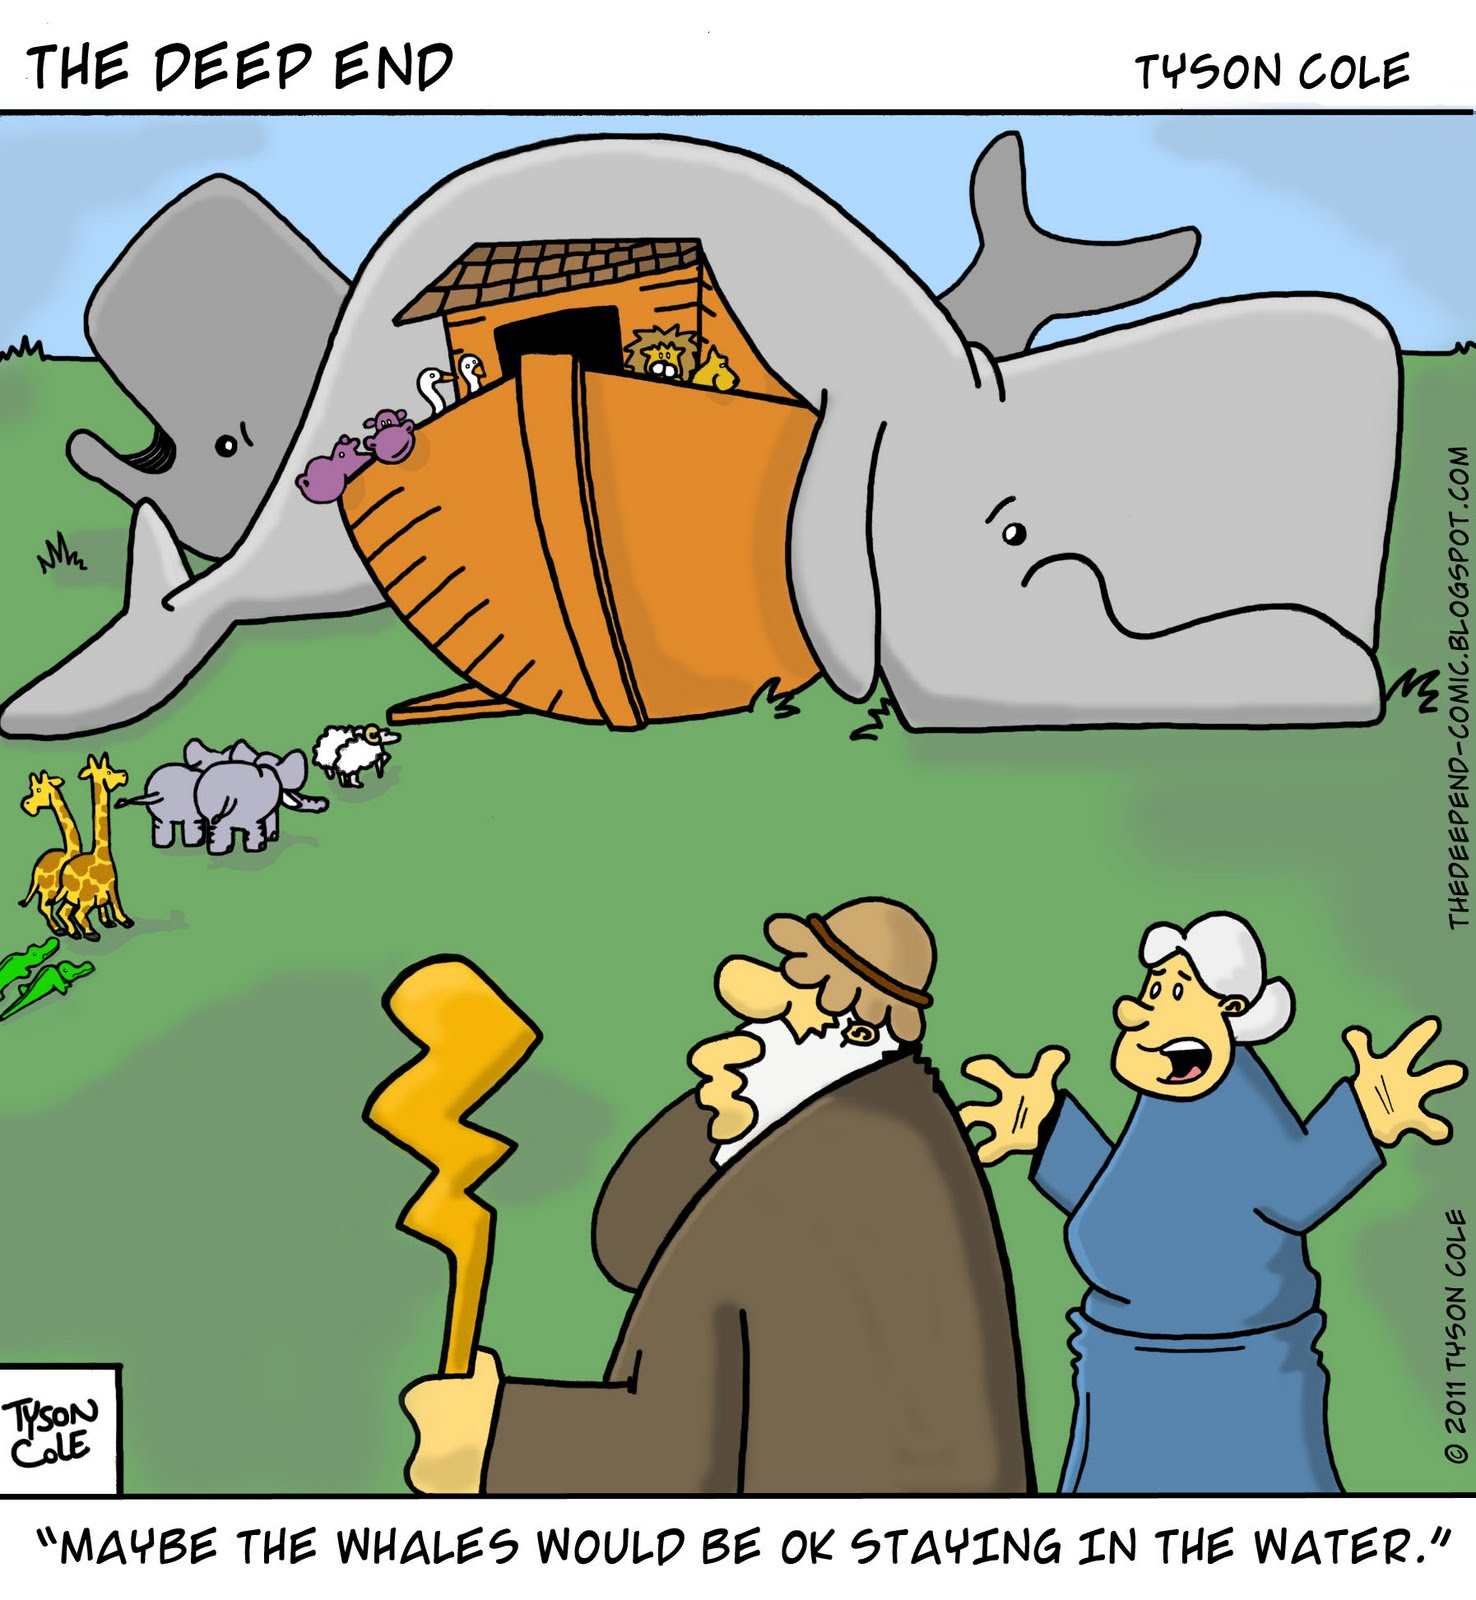 Humor clipart 21 (16) of humor Religious